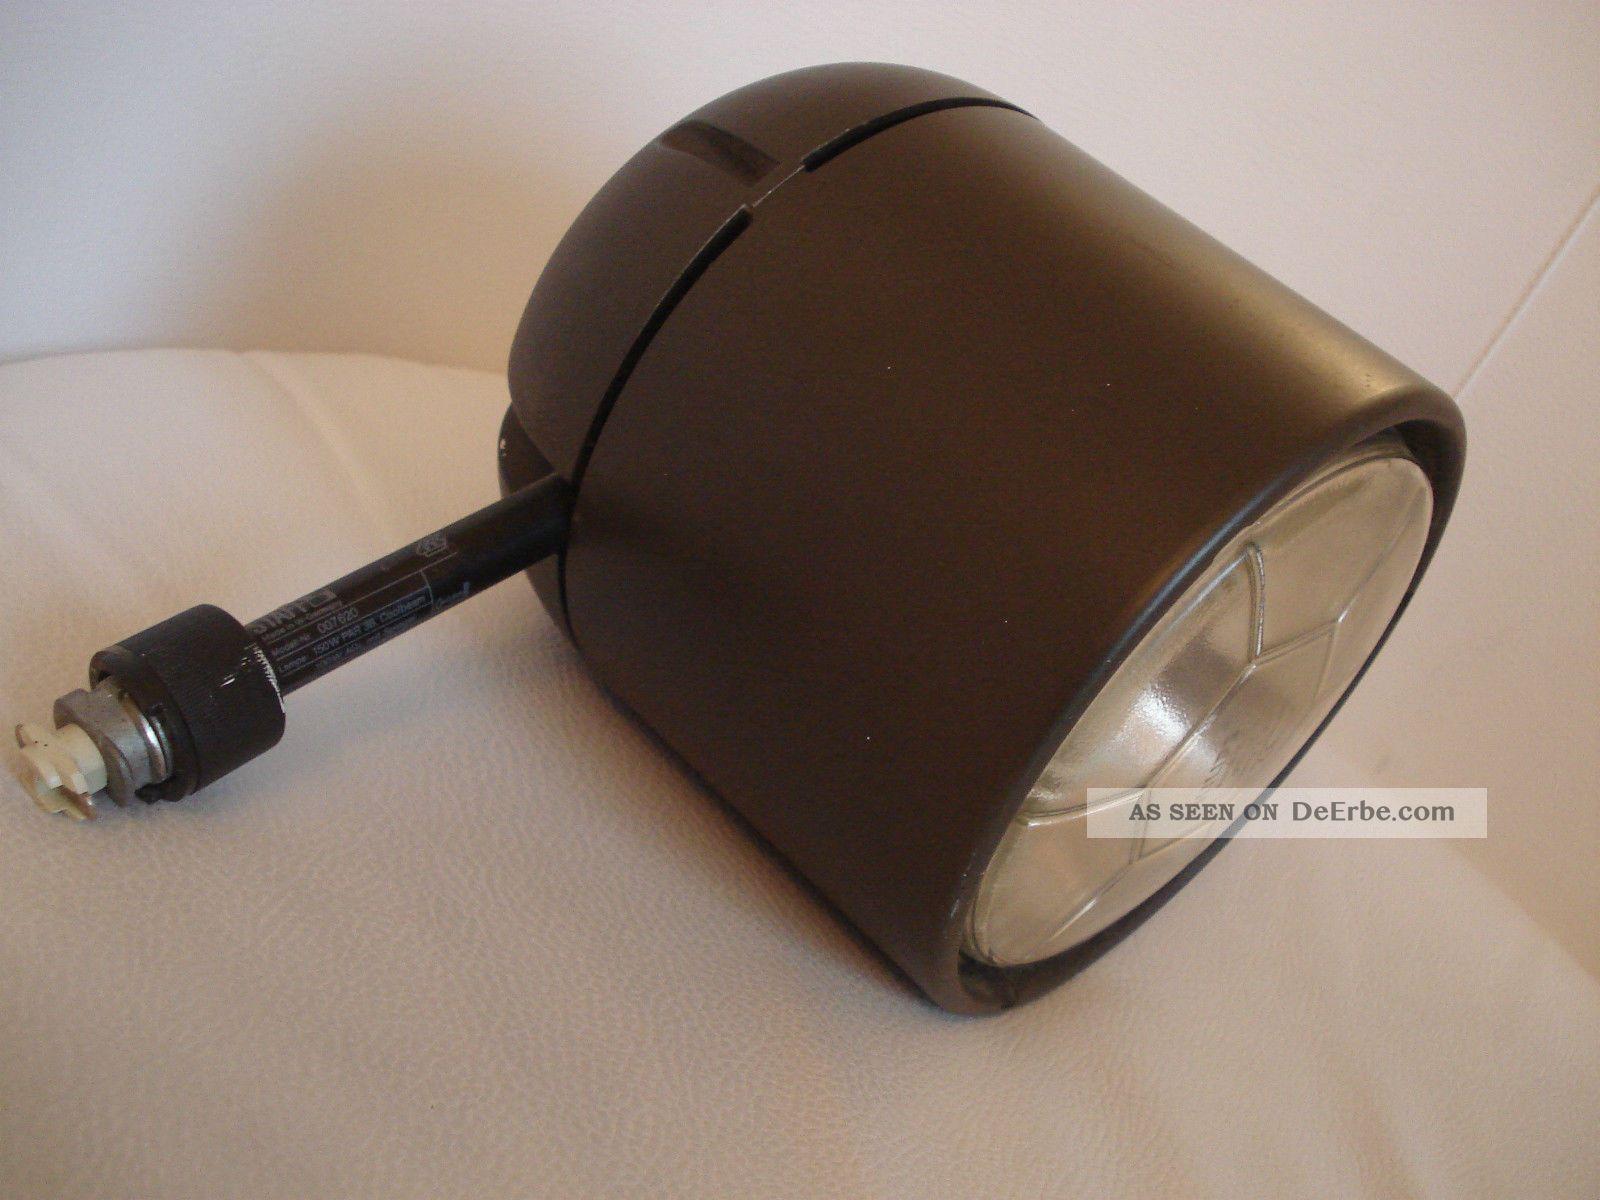 70er true vintage staff strahler f r schiene braun modell 007620. Black Bedroom Furniture Sets. Home Design Ideas